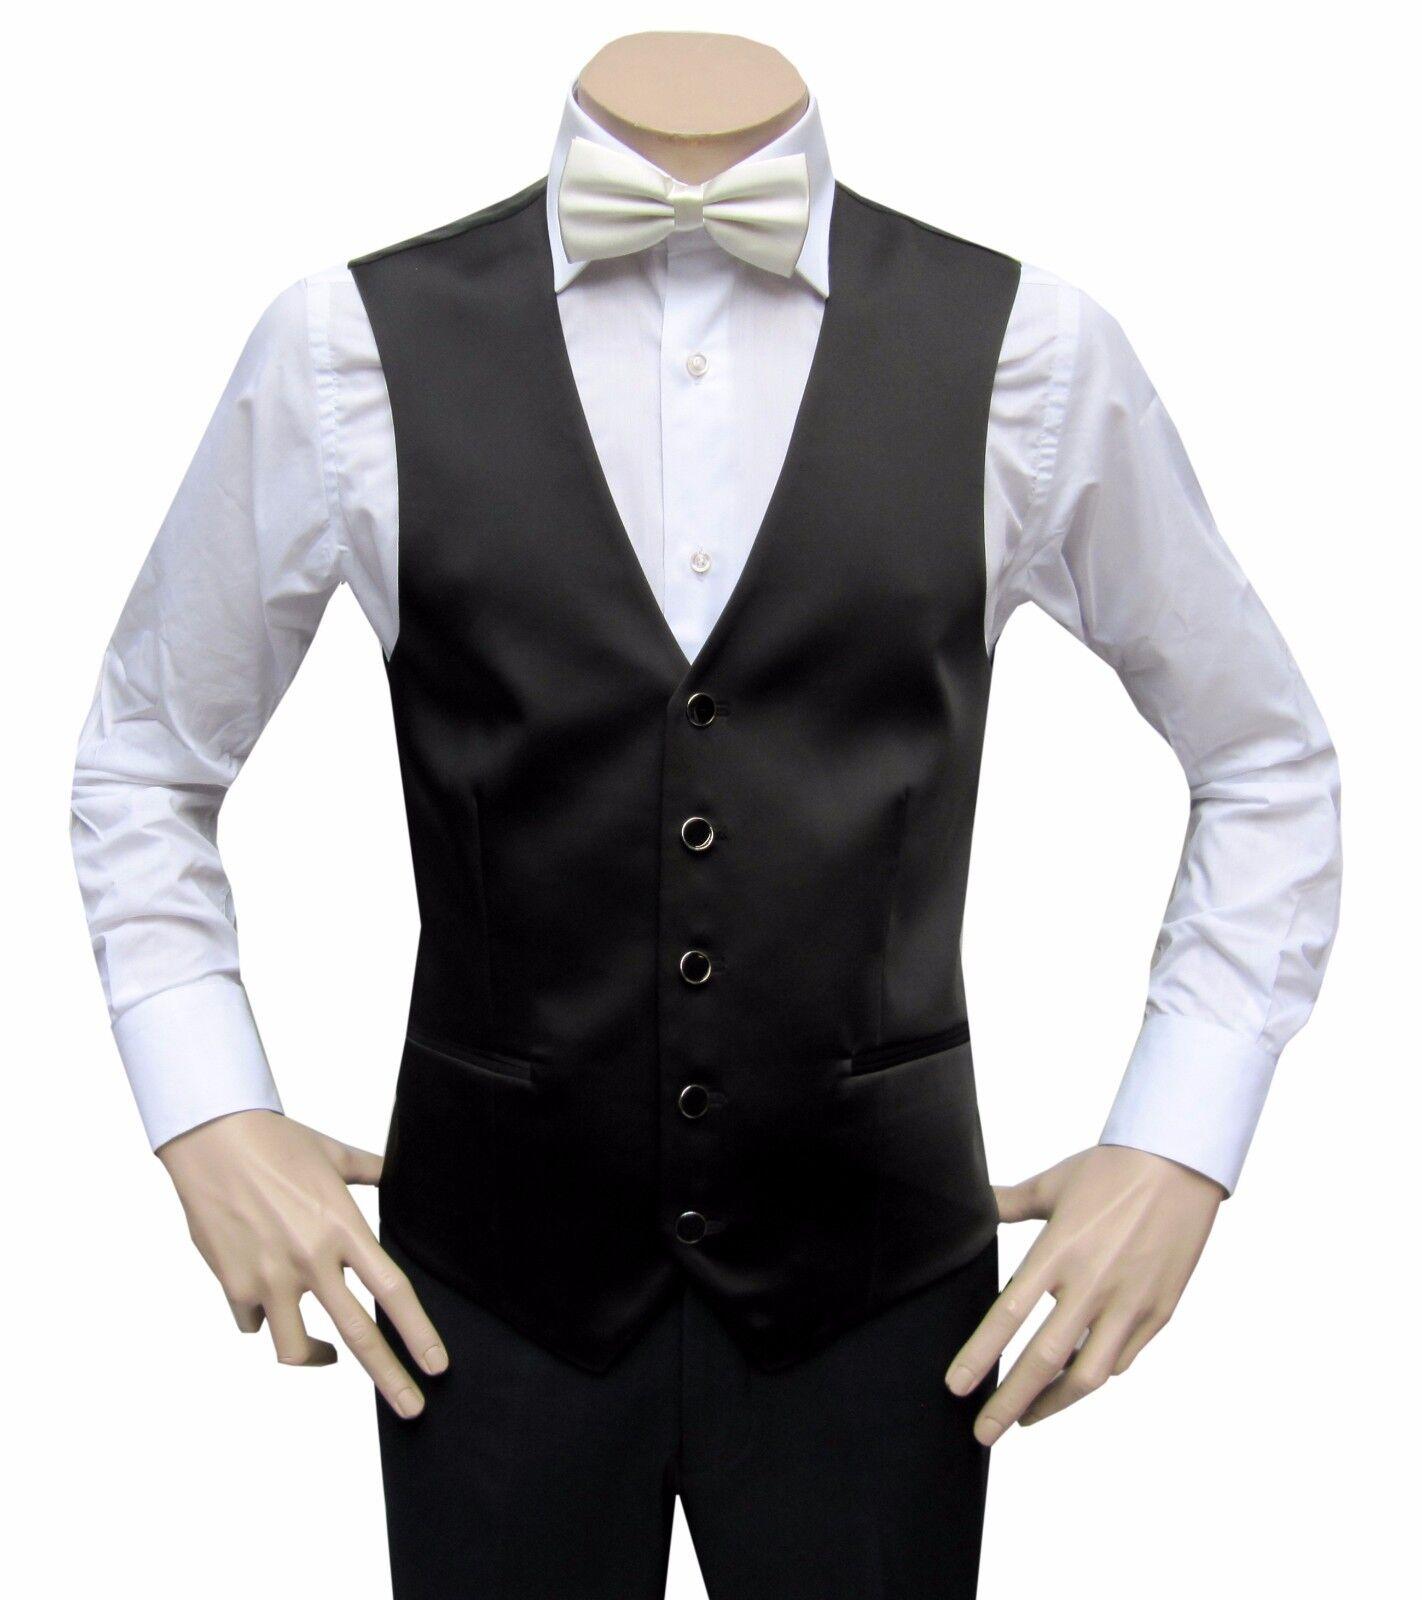 Men's Satin Vest With Cream Bow Tie 2 Pieces Gr.56 Black